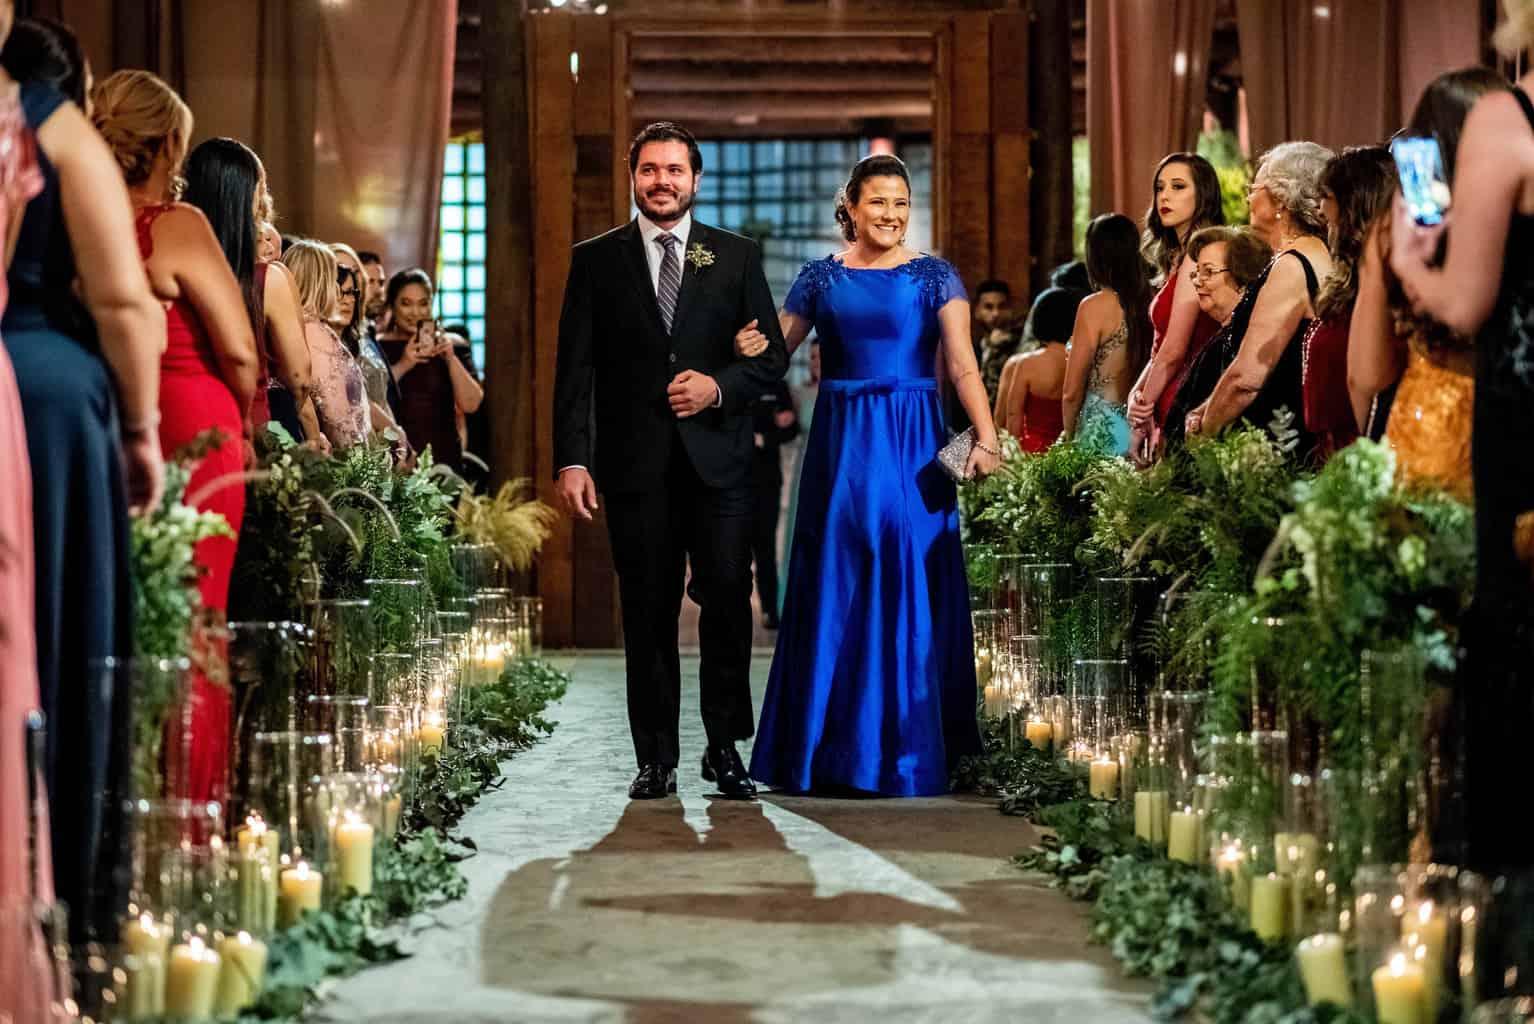 Bel-Benkler-eventos-Casamento-Ariane-e-Matheus-cerimonia-decoracao-contemporanea-fotografia-Rafael-Bigarelli-noivos-na-pista-Spazio-Giardini-29